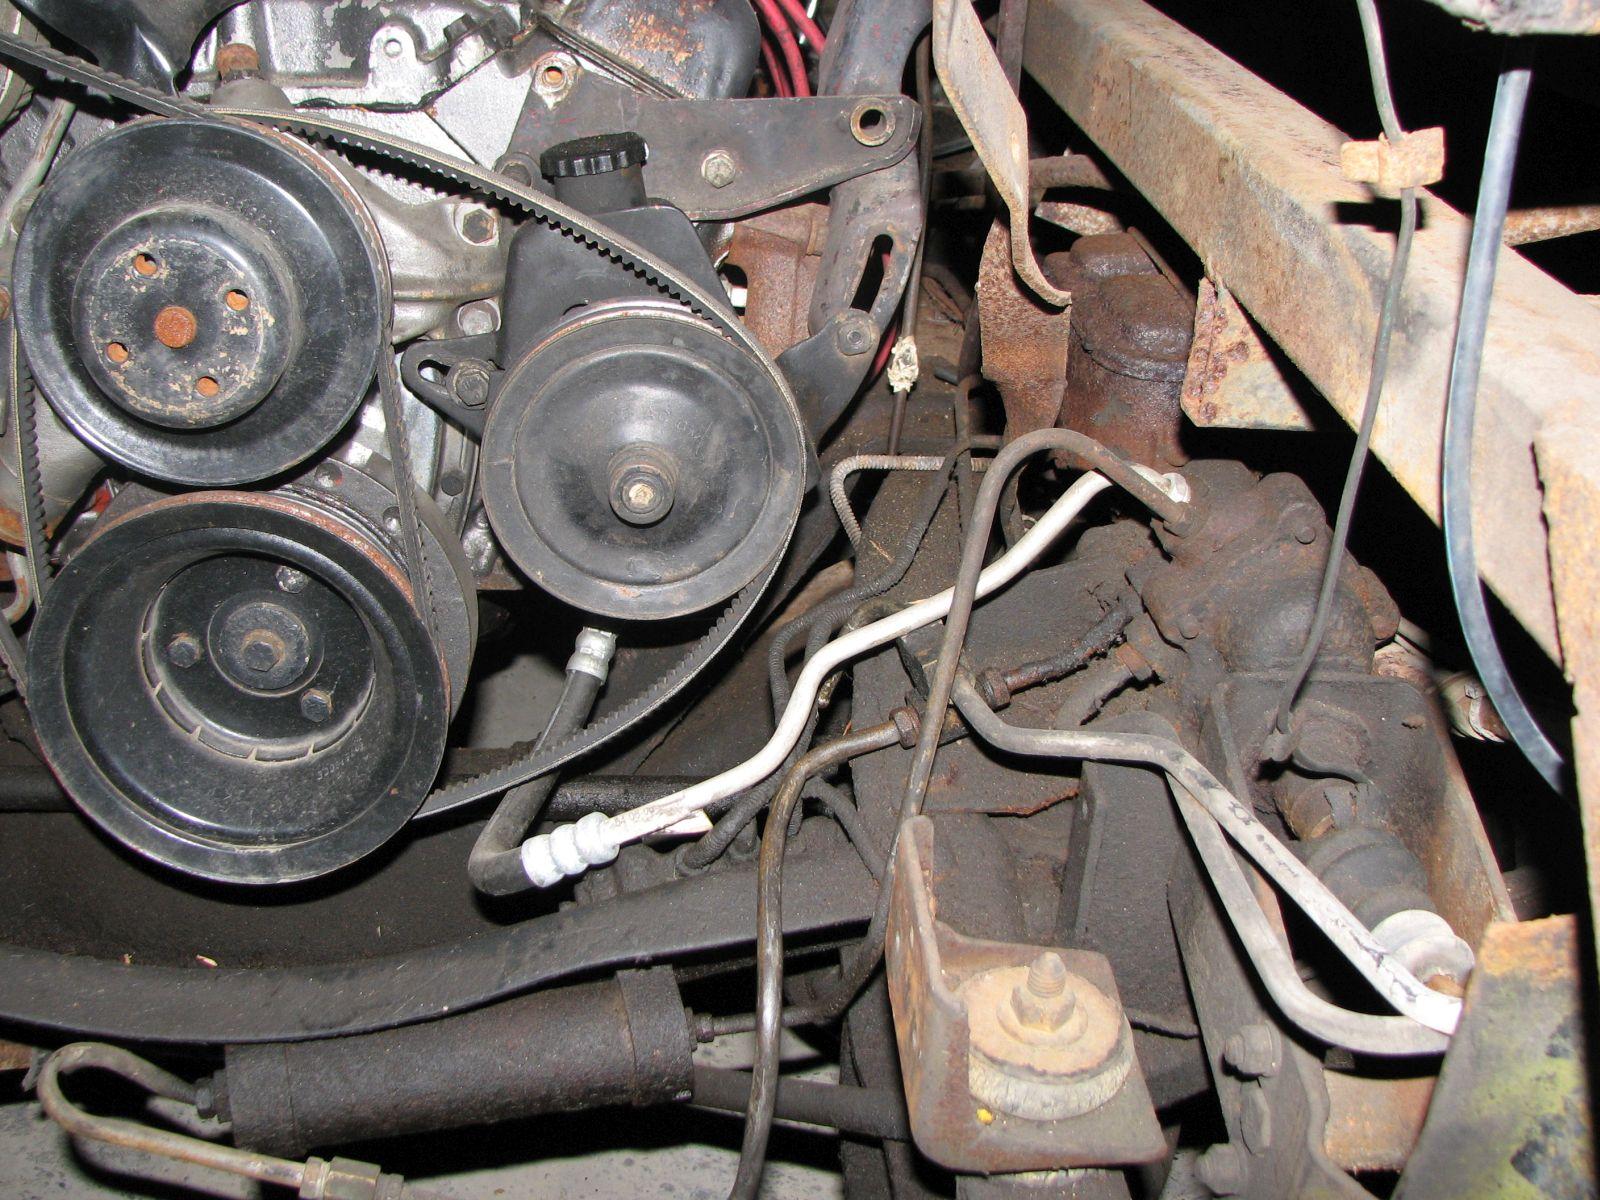 Click image for larger version  Name:74-argosy-brake-piping.jpg Views:51 Size:368.9 KB ID:261592